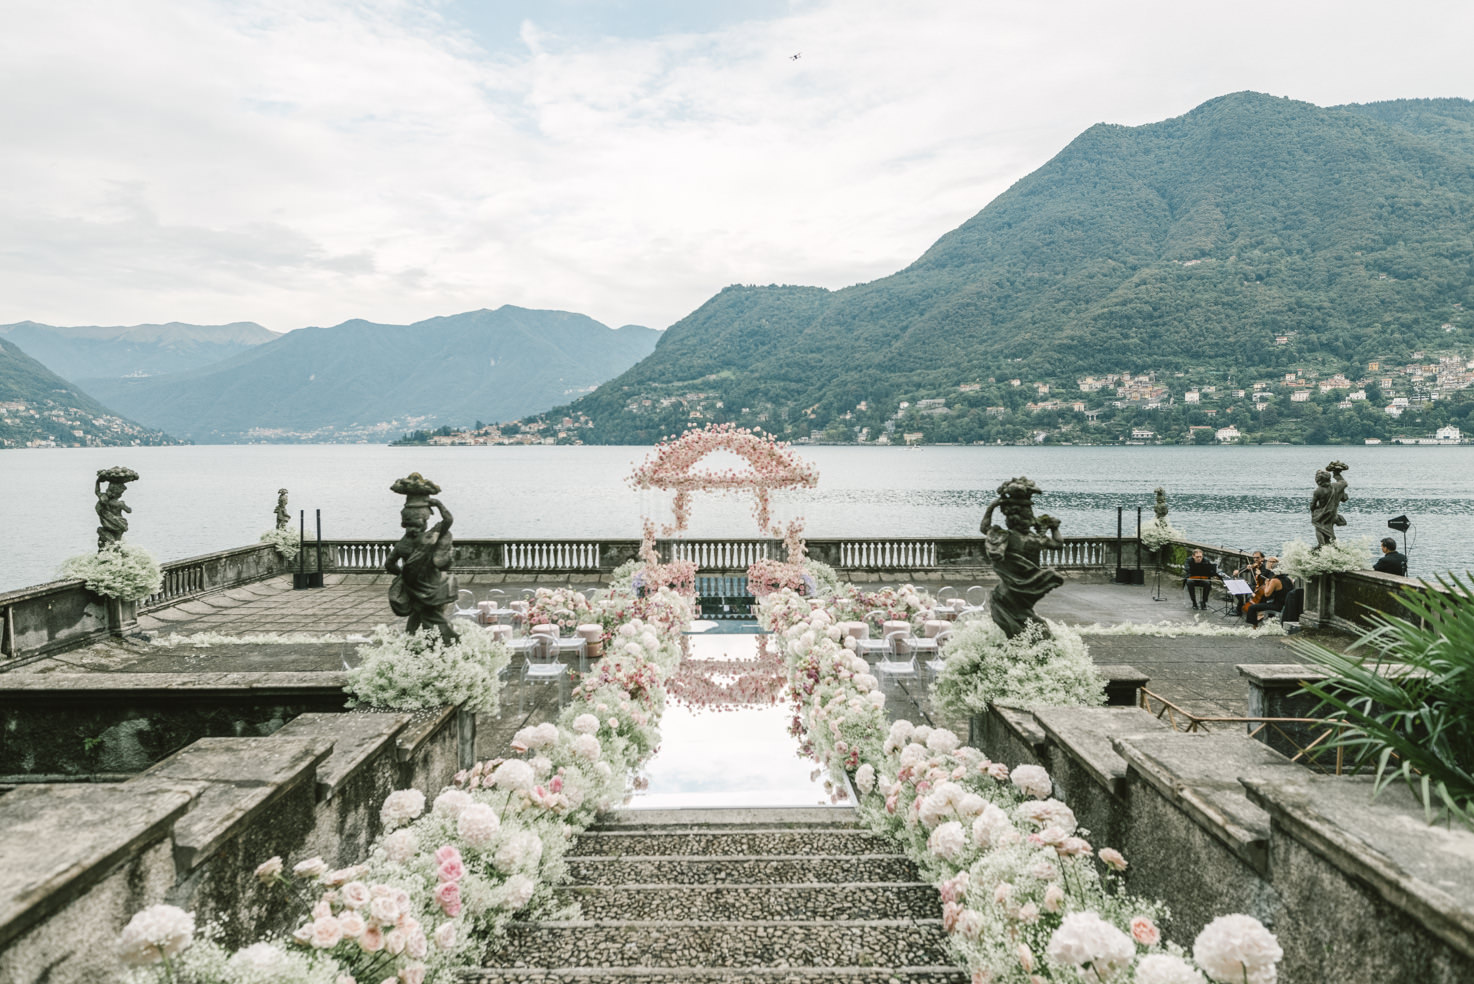 Wedding ceremony in the gardens of Villa Pizzo on Lake Como